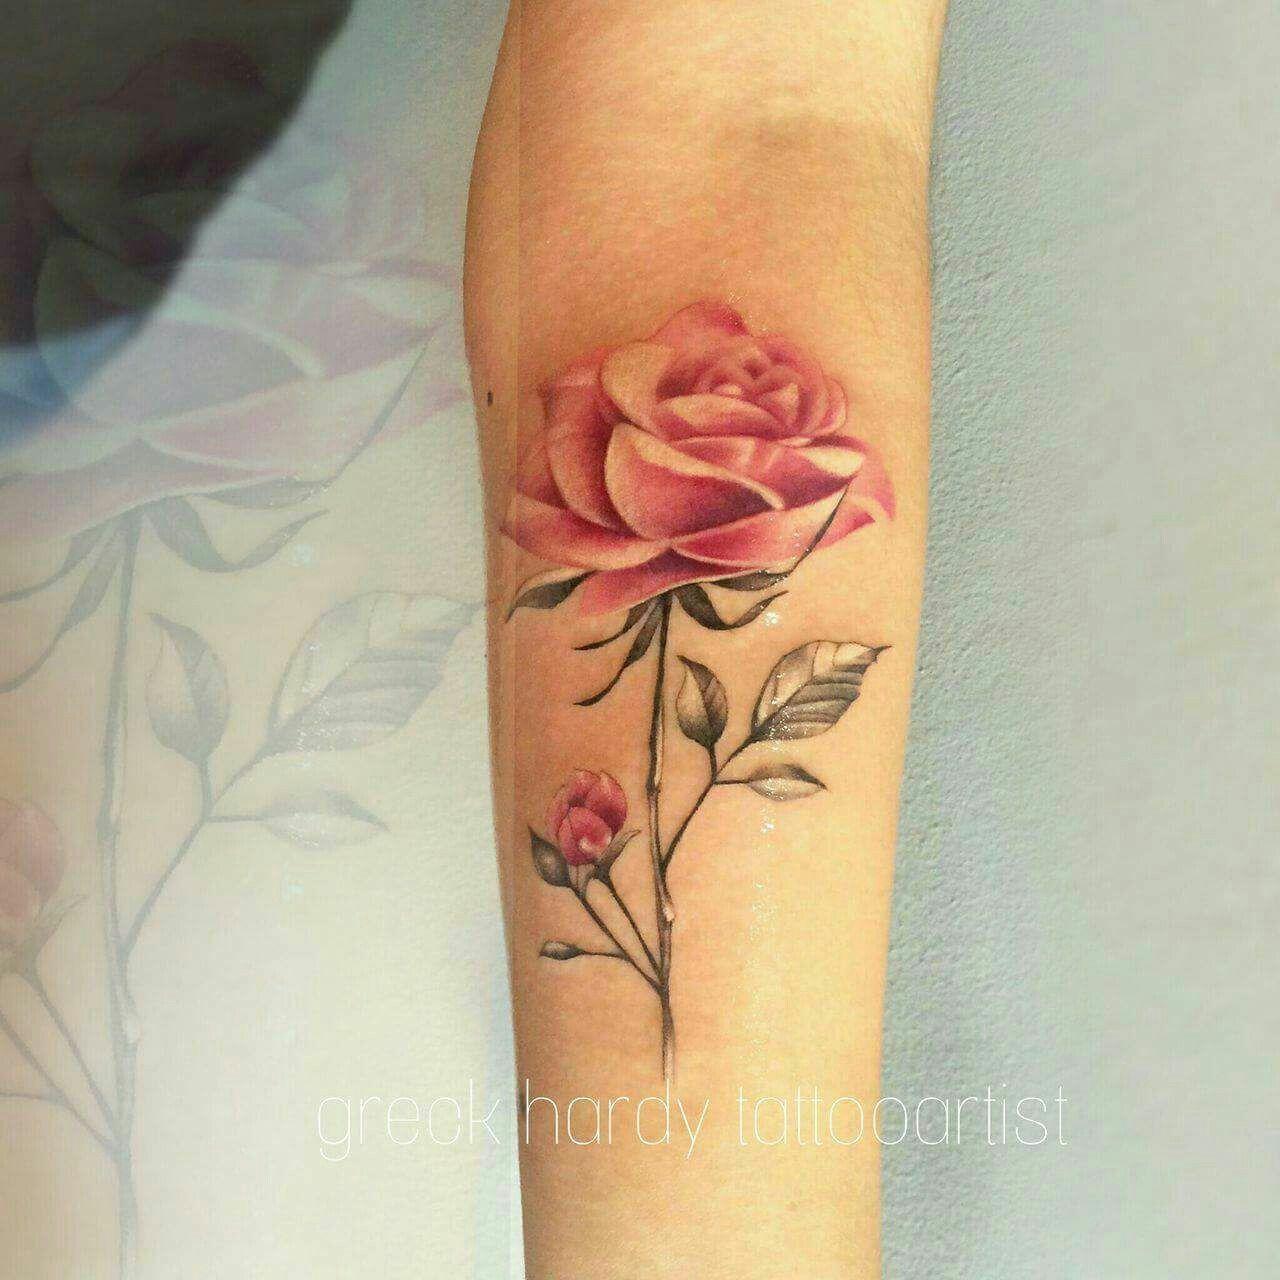 tatuaje rosa by grek hardy tatuadorespoblanos tattoos. Black Bedroom Furniture Sets. Home Design Ideas